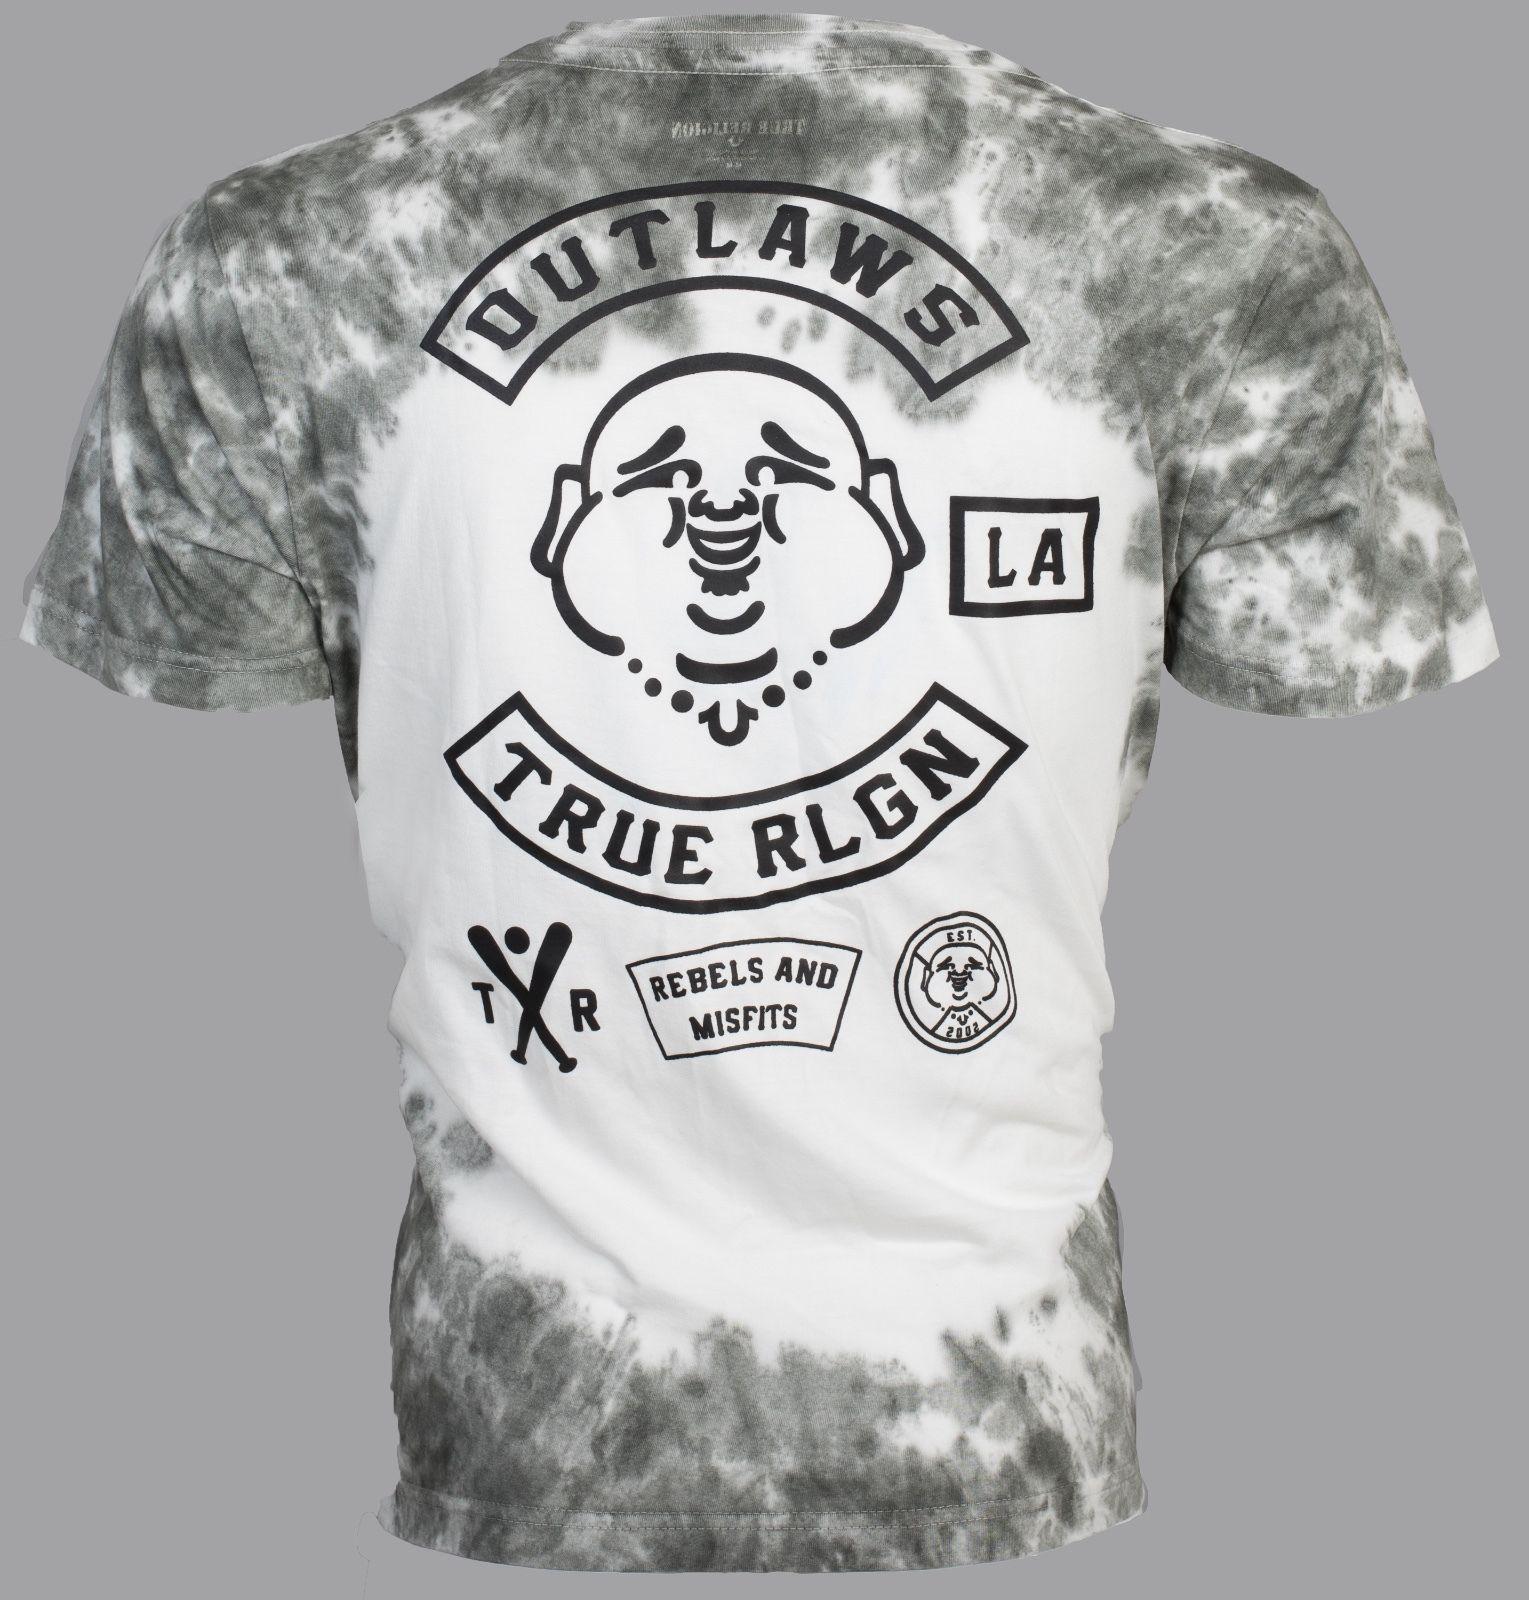 5ee72f5d6ea55 True Religion Mens T-Shirt Outlaws Buddha Dark Grey Tie Dye  89 Jeans Nwt